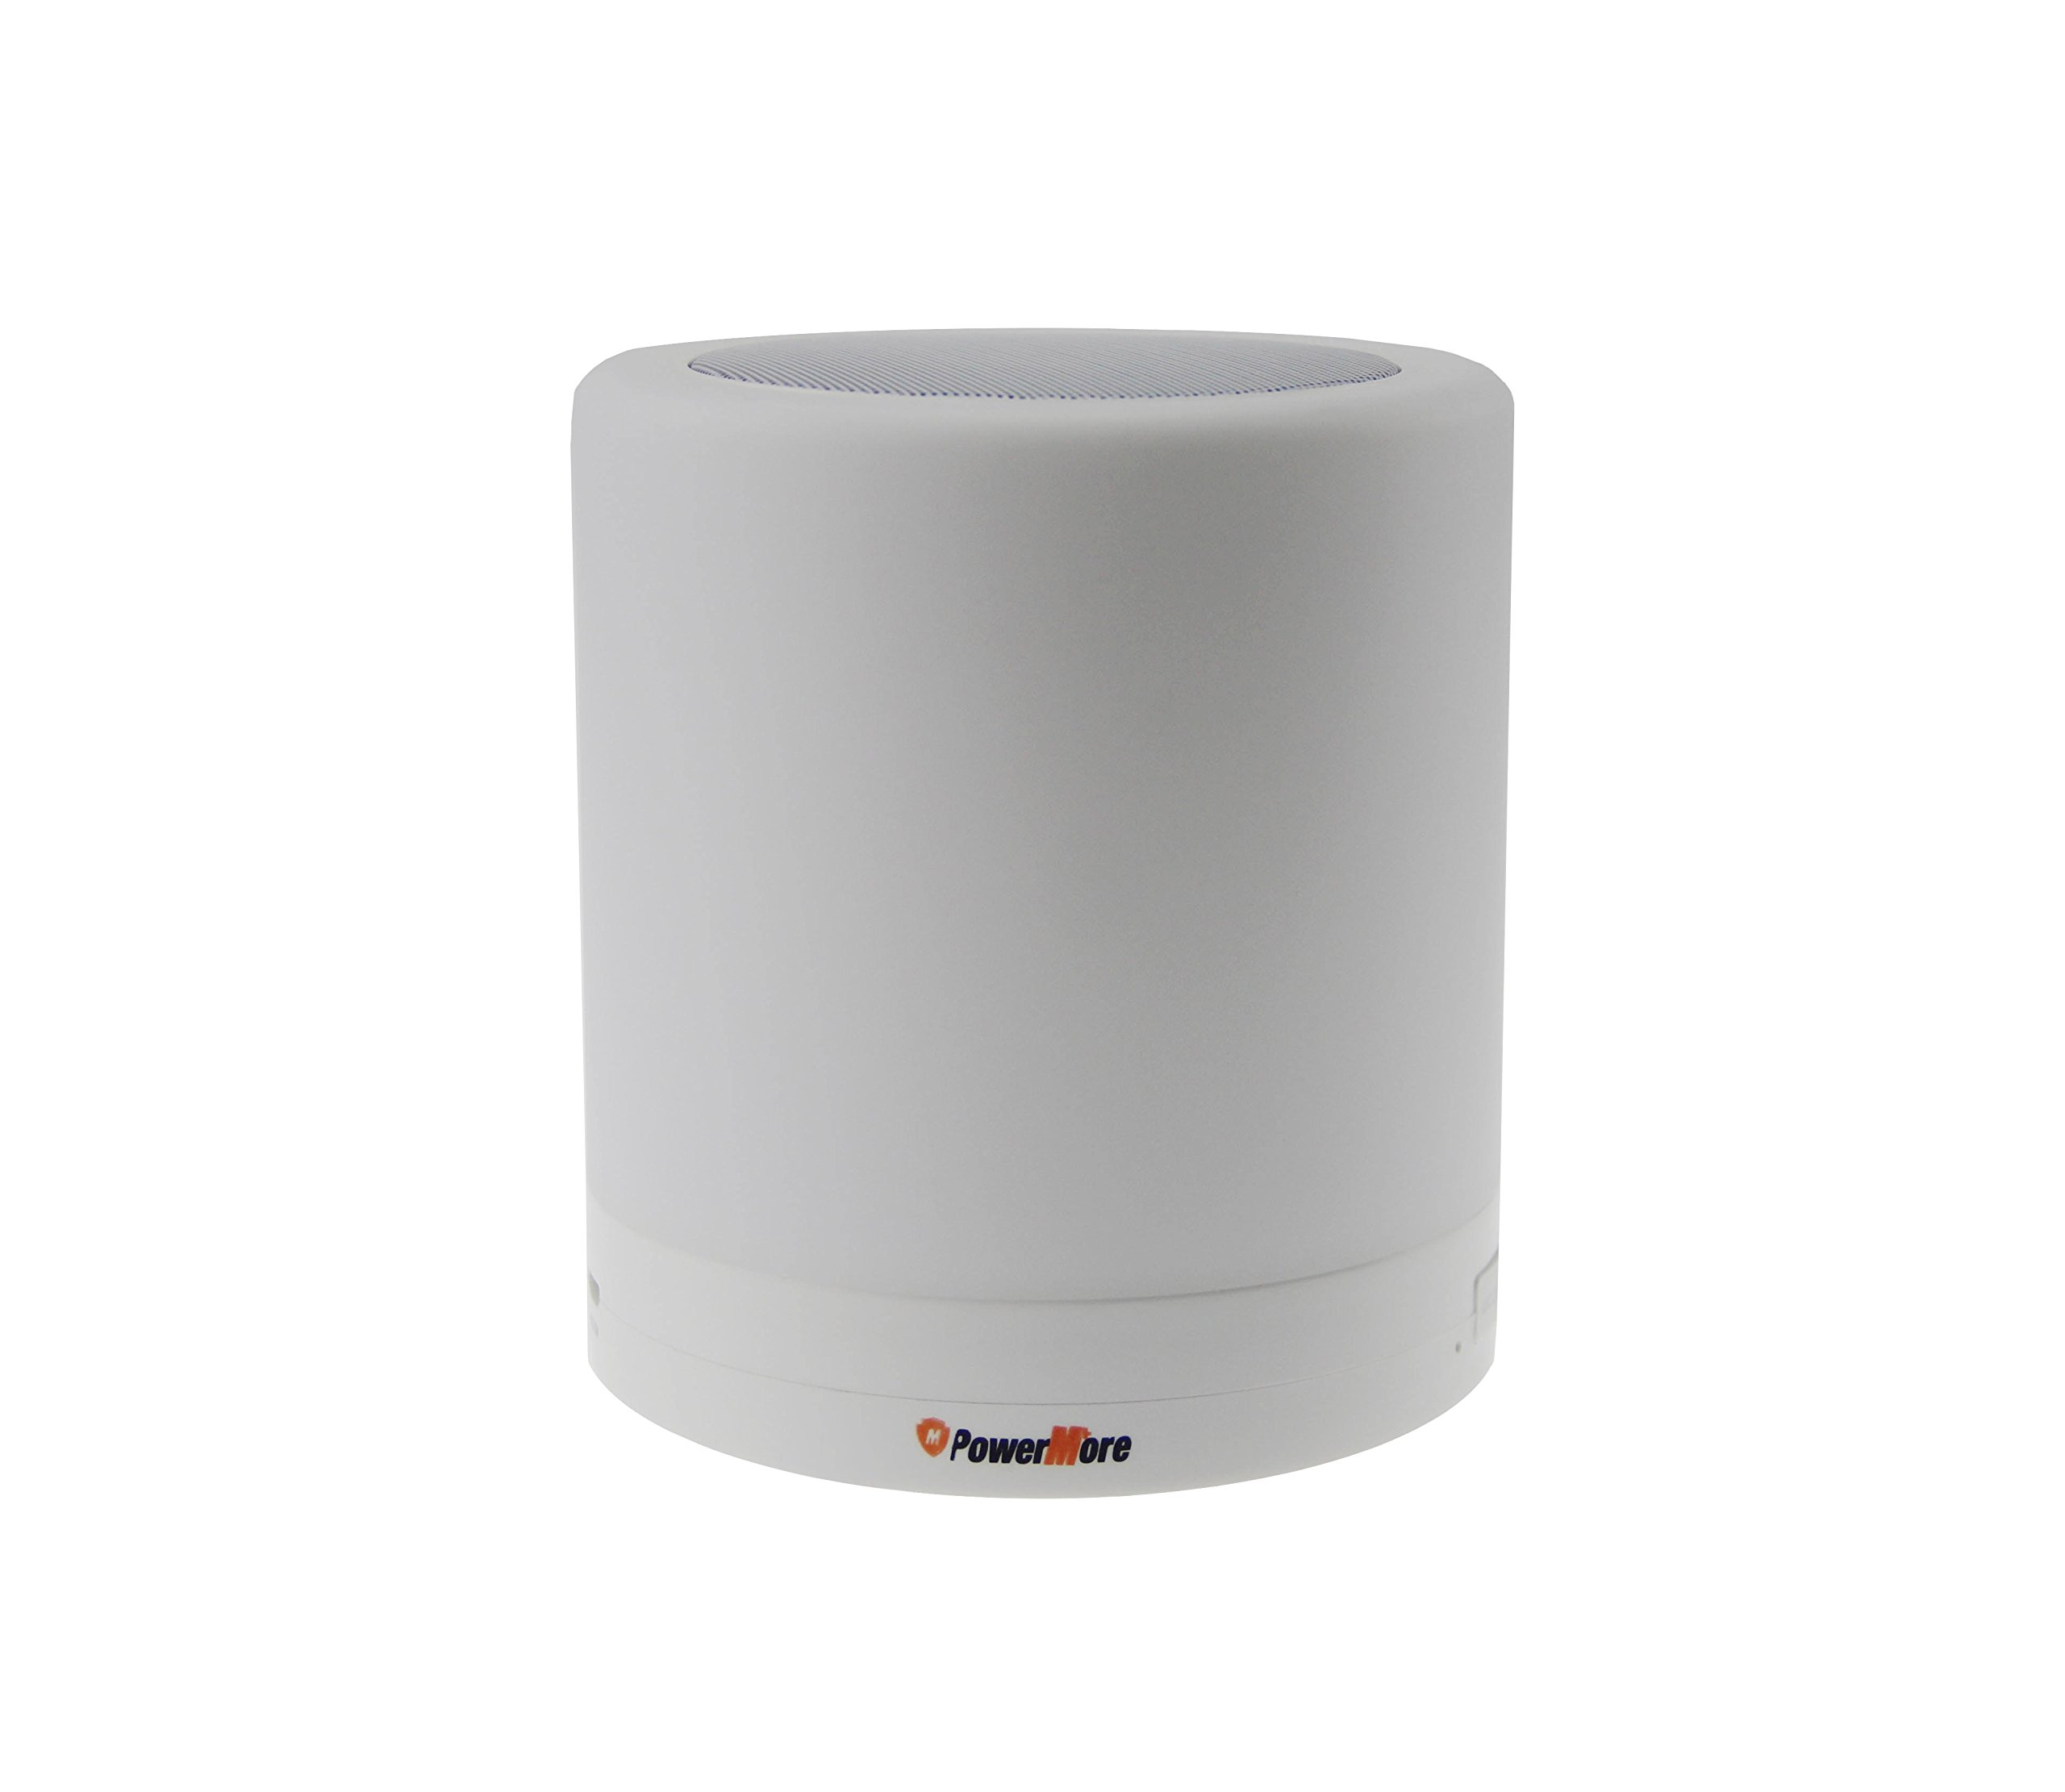 PowerMore Smart LED Lamp With Bluetooth Speaker, Touch Sensor light, Music Player, Hands free Bluetooth Speakerphone (Big 5W)